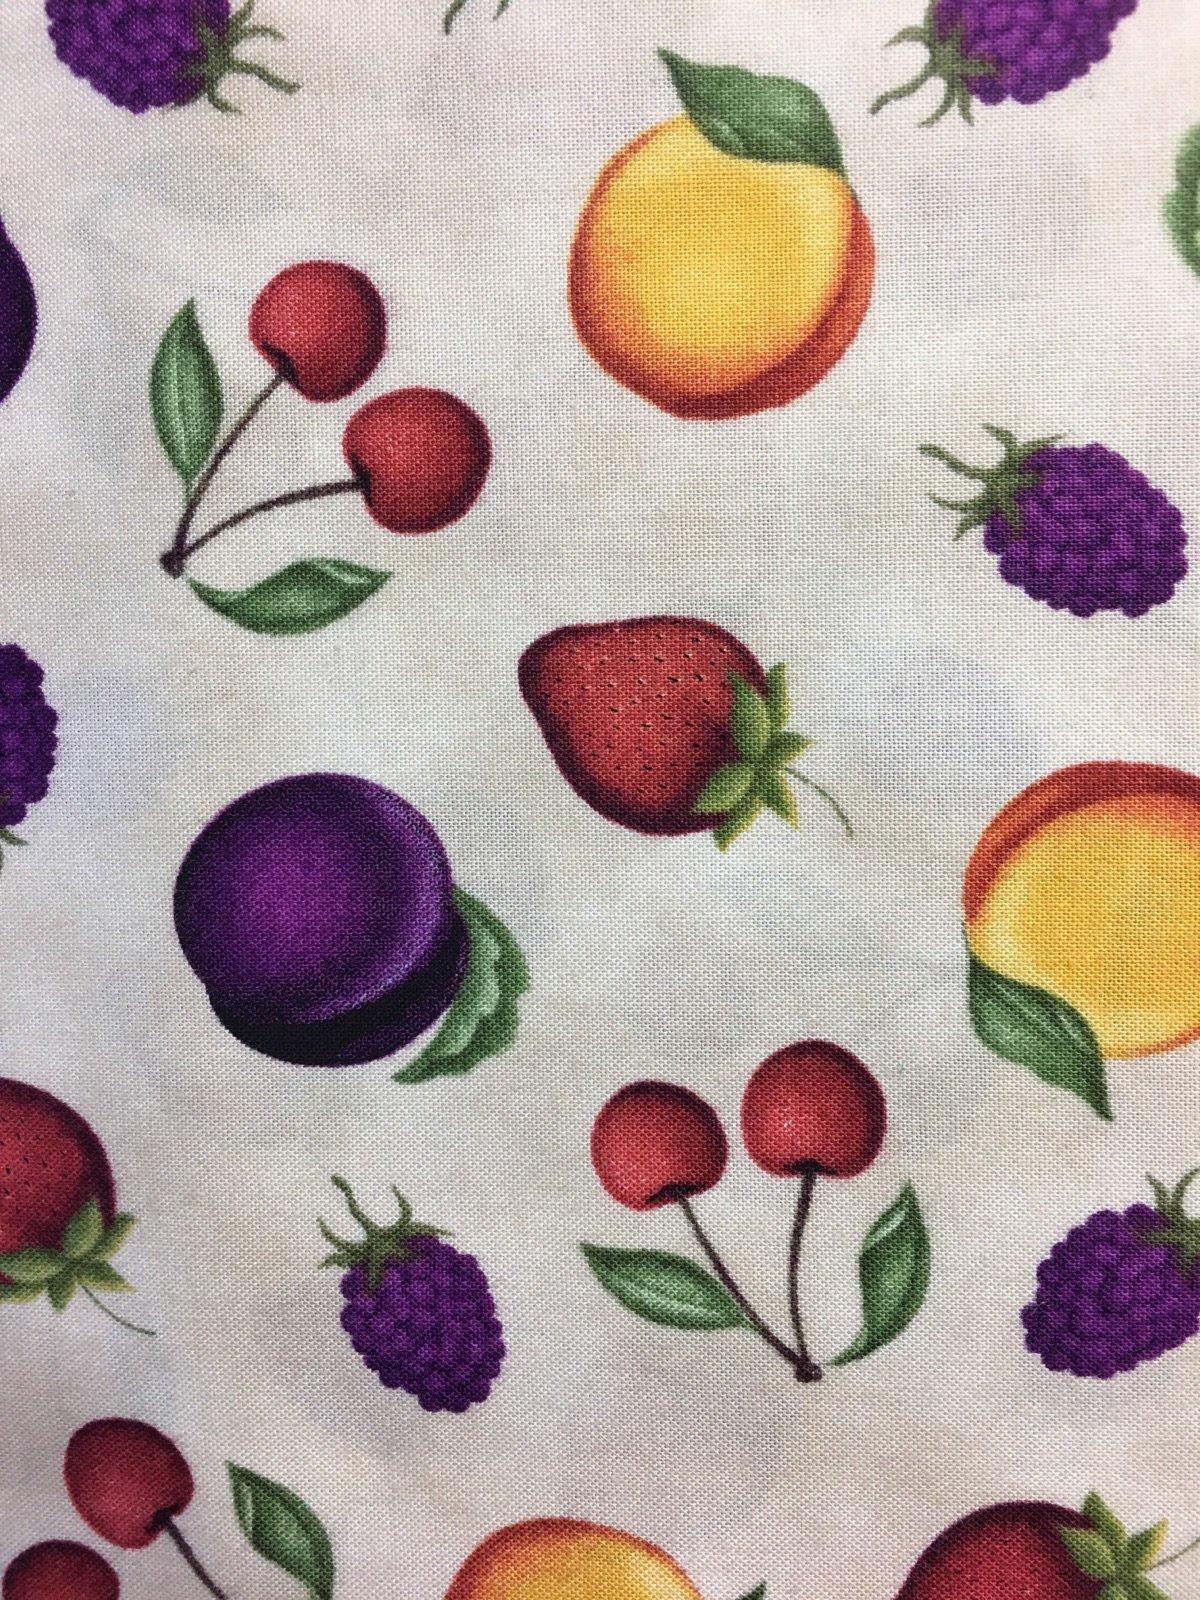 Farmer's Market - Fruit 1649-22343-A